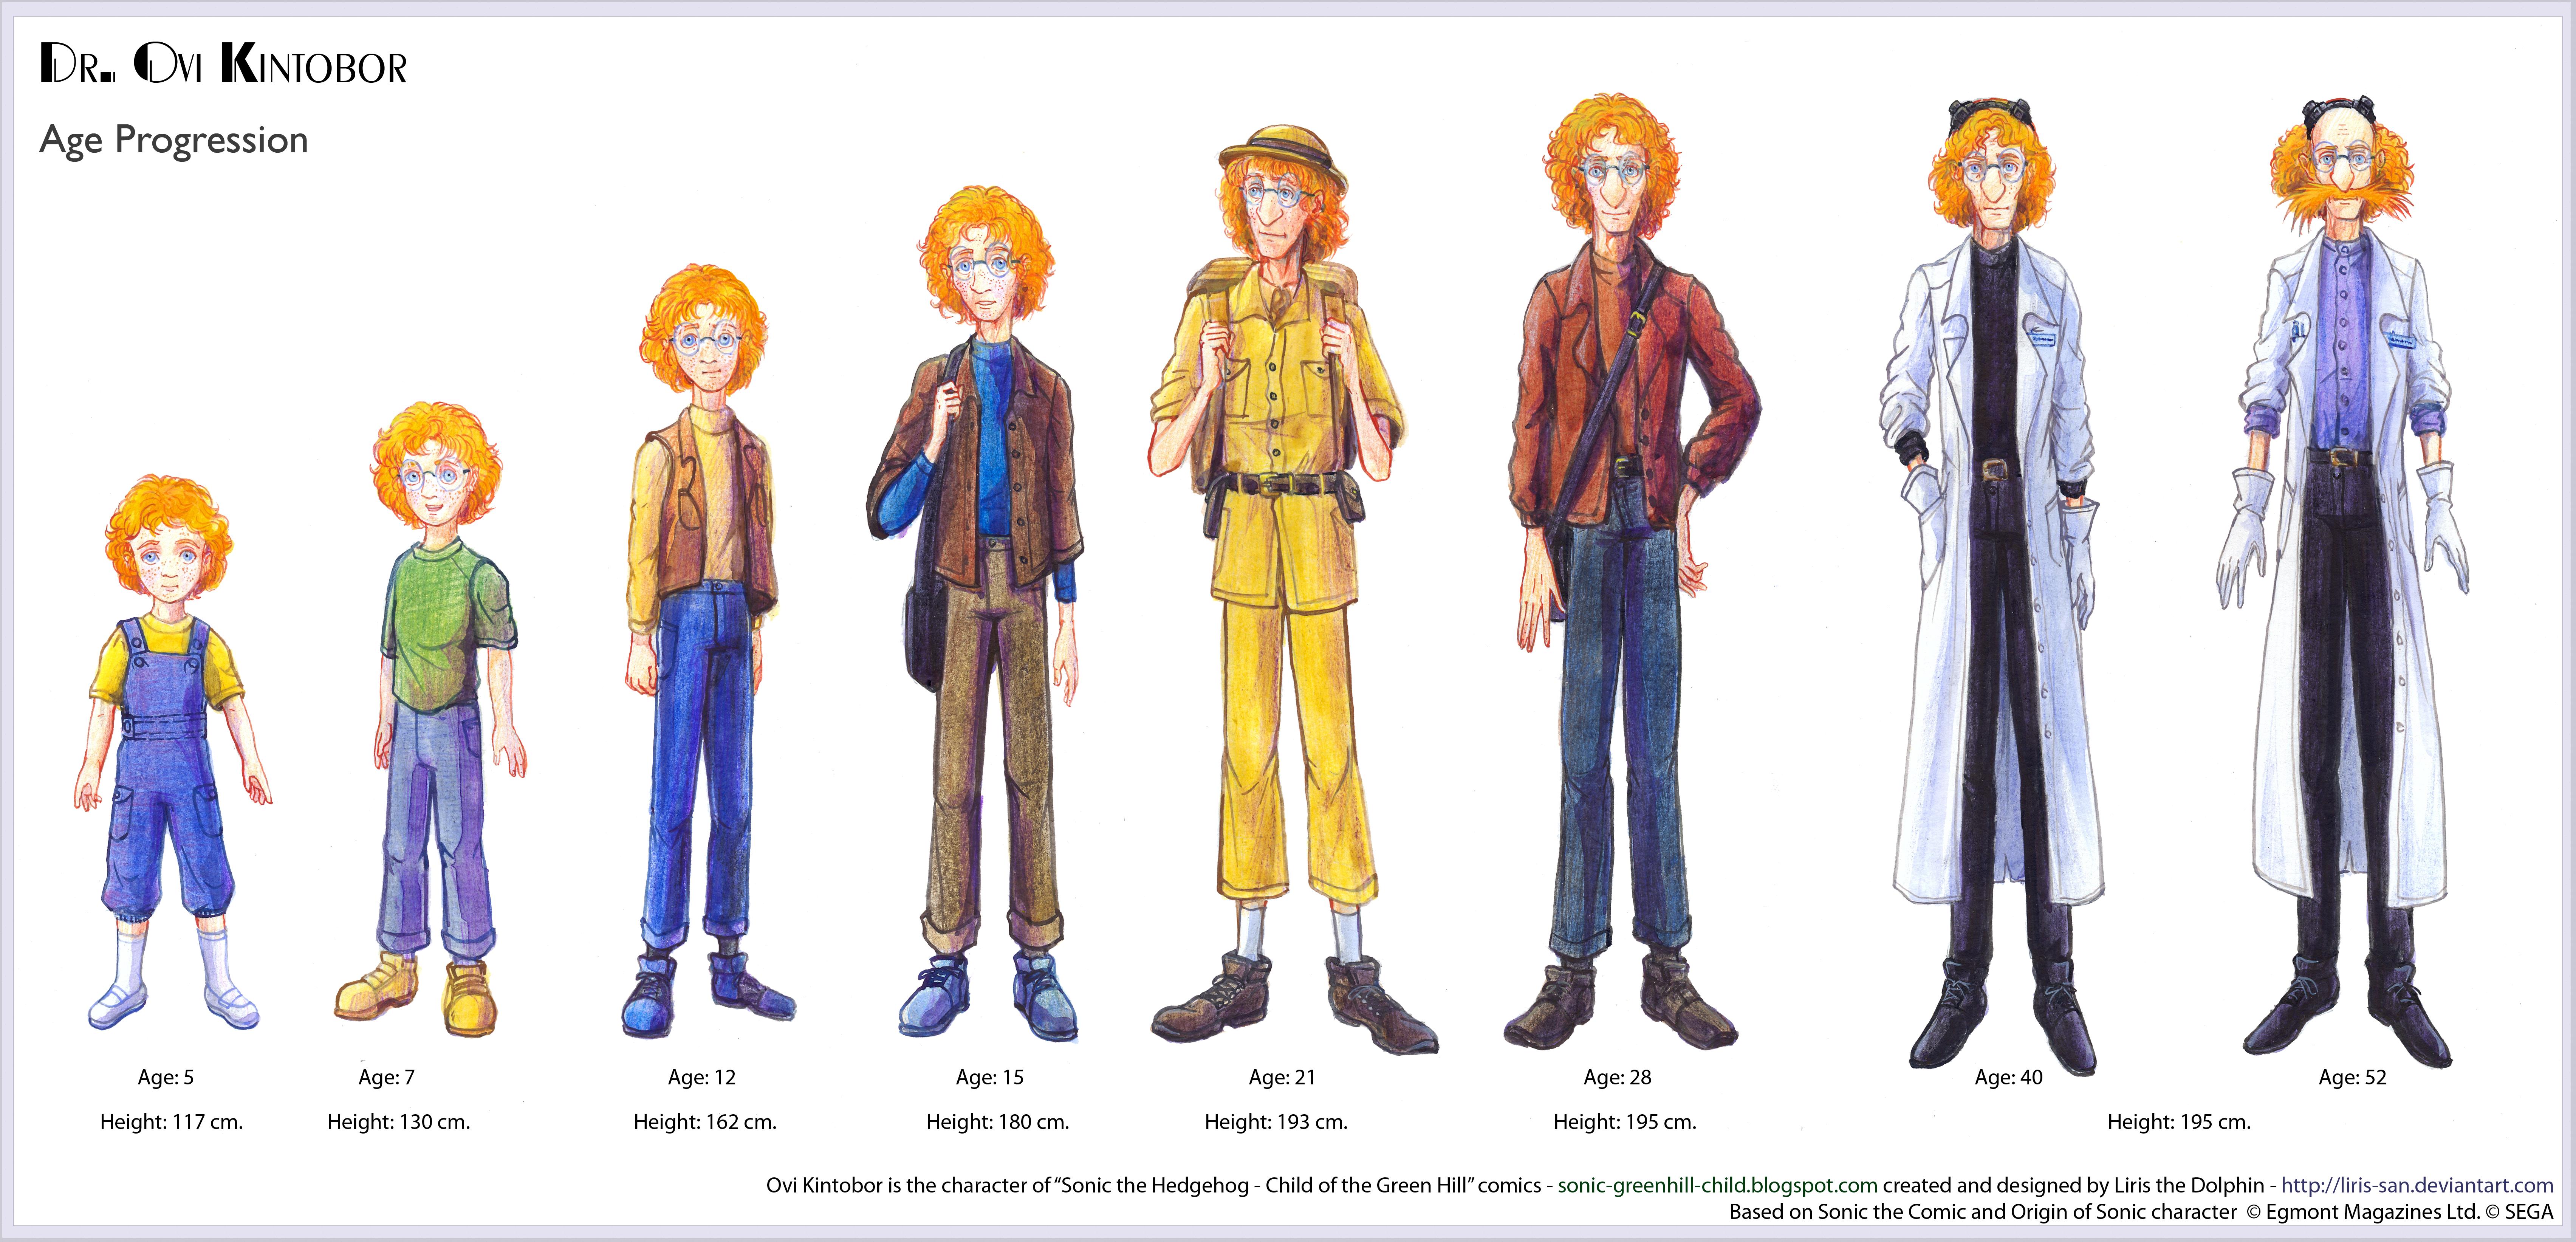 age progression ... Age Progression - Ovi Kintobor by Liris-san